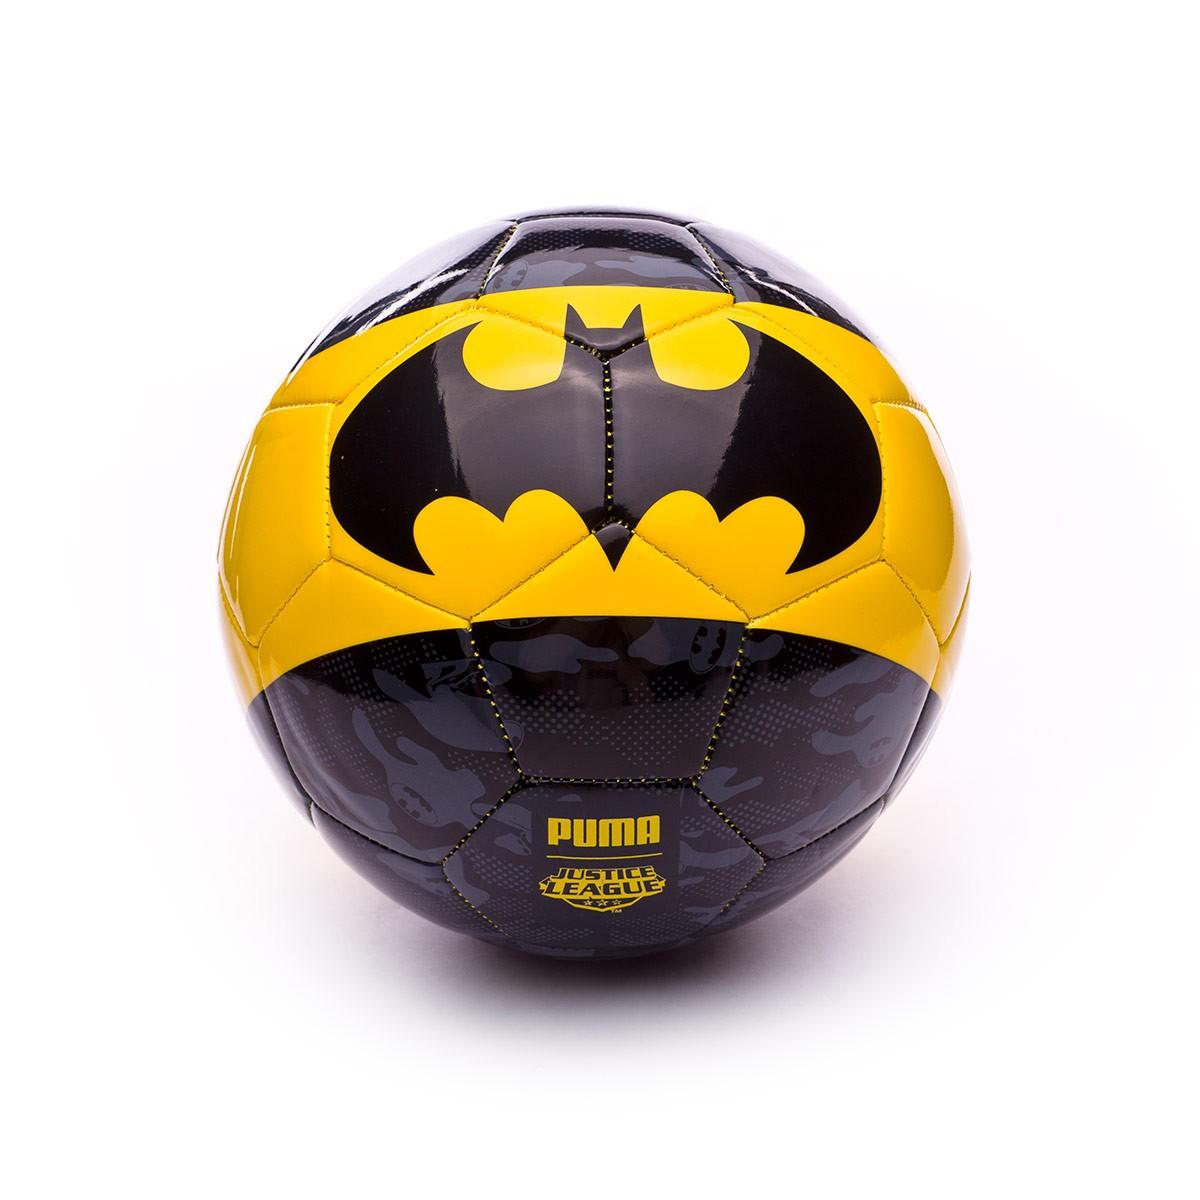 c32fa82bec633 Balón Puma Superhero Lite 350 Puma Black-Dandelion-BATMAN - Tienda de  fútbol Fútbol Emotion